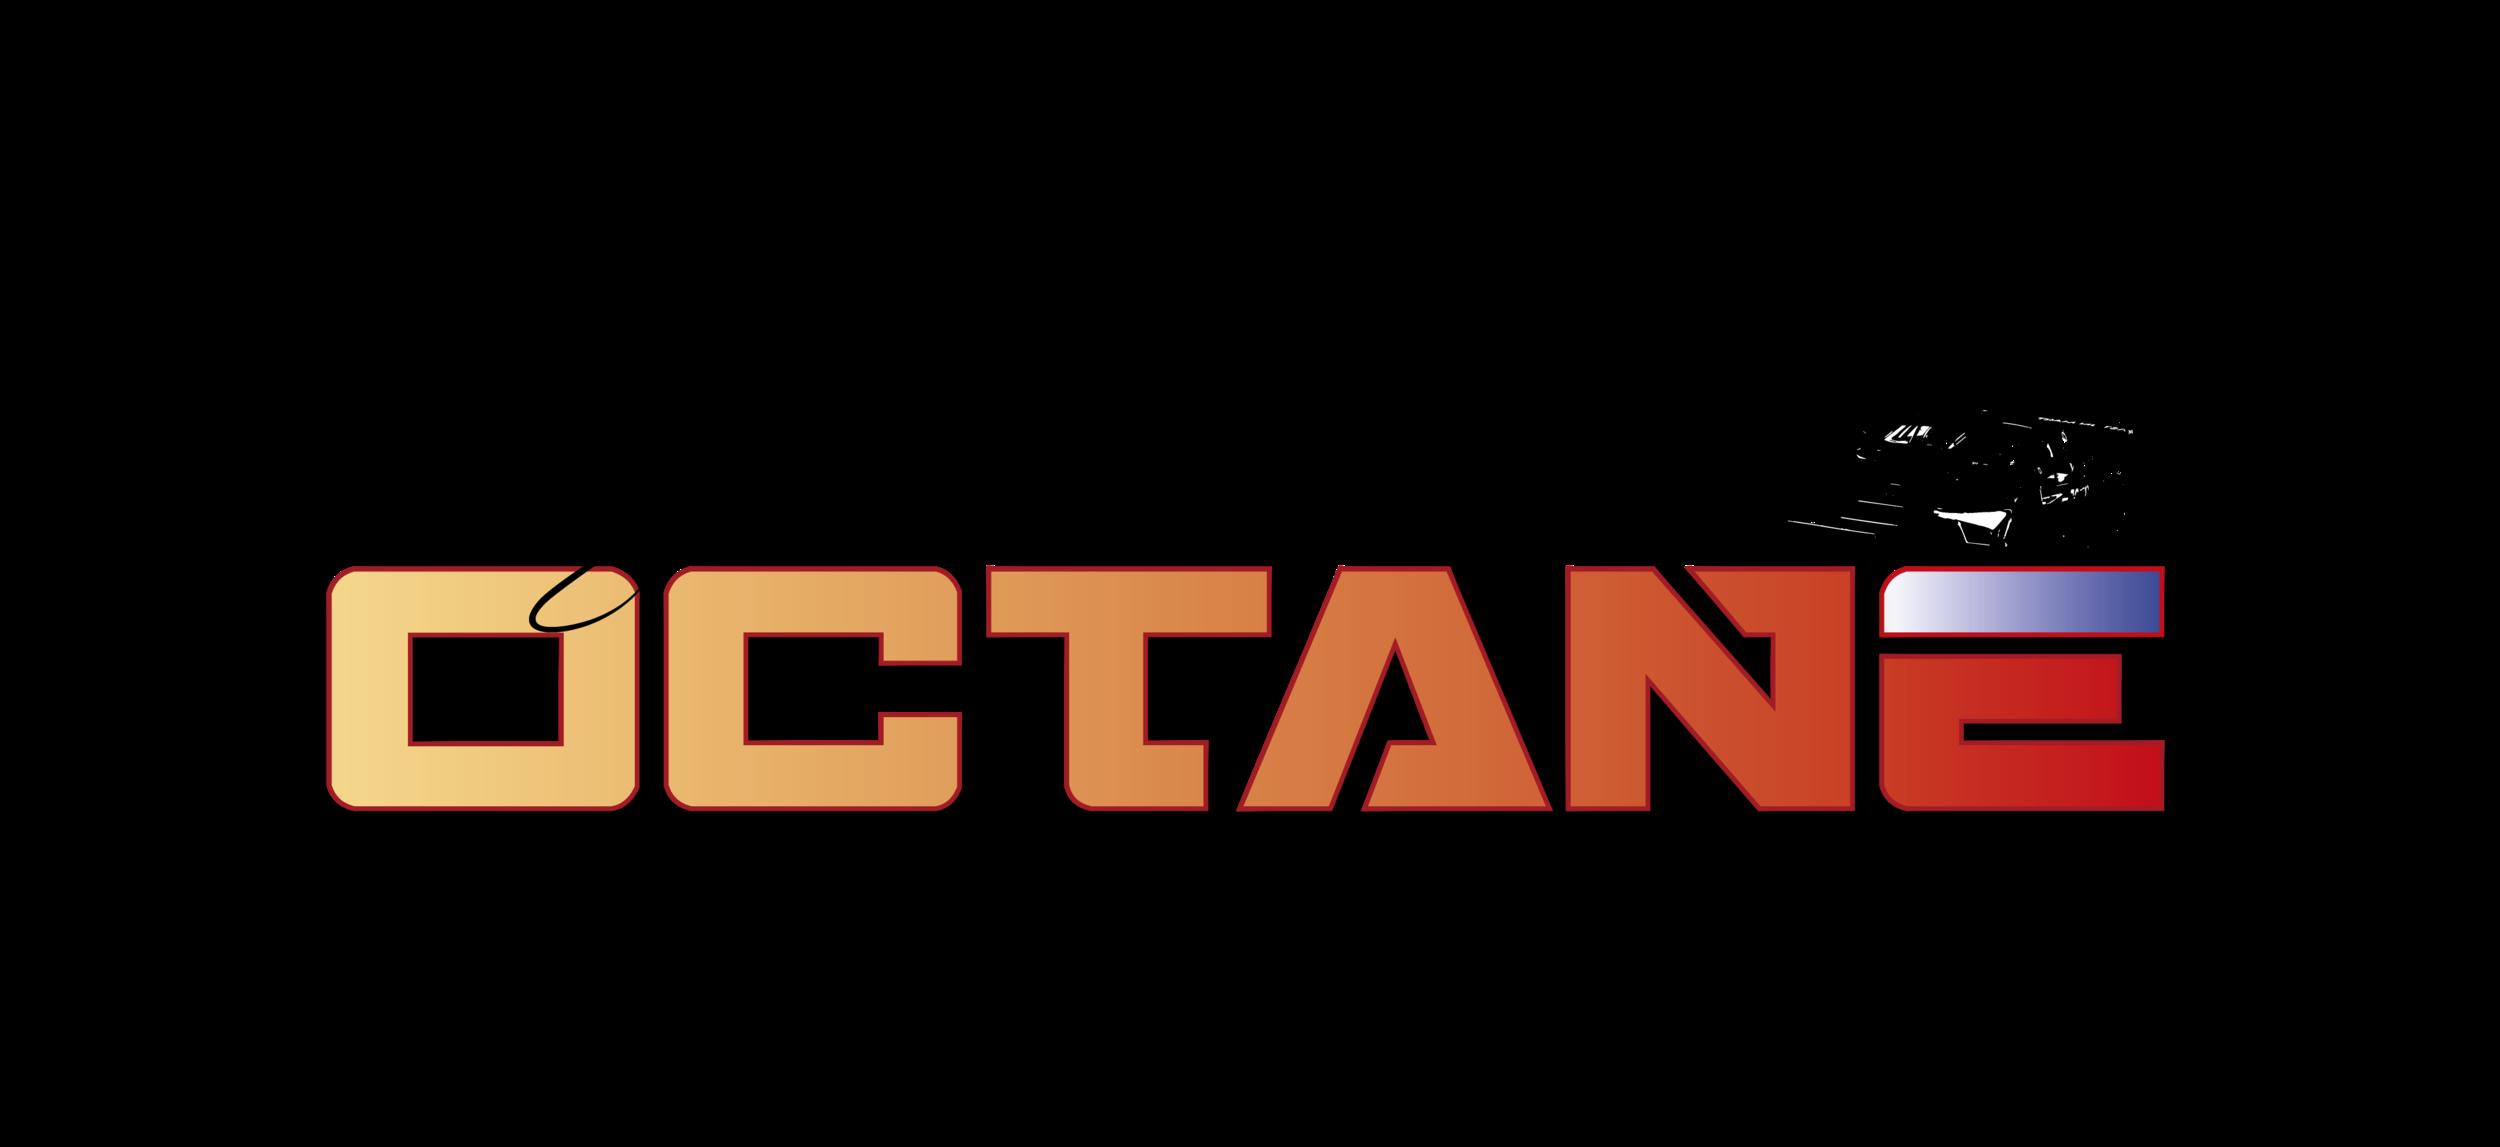 High OCTANE MEDIA - Editor and photographerFacebook: @highoctanemedia1Instagram: highoctanemedia1